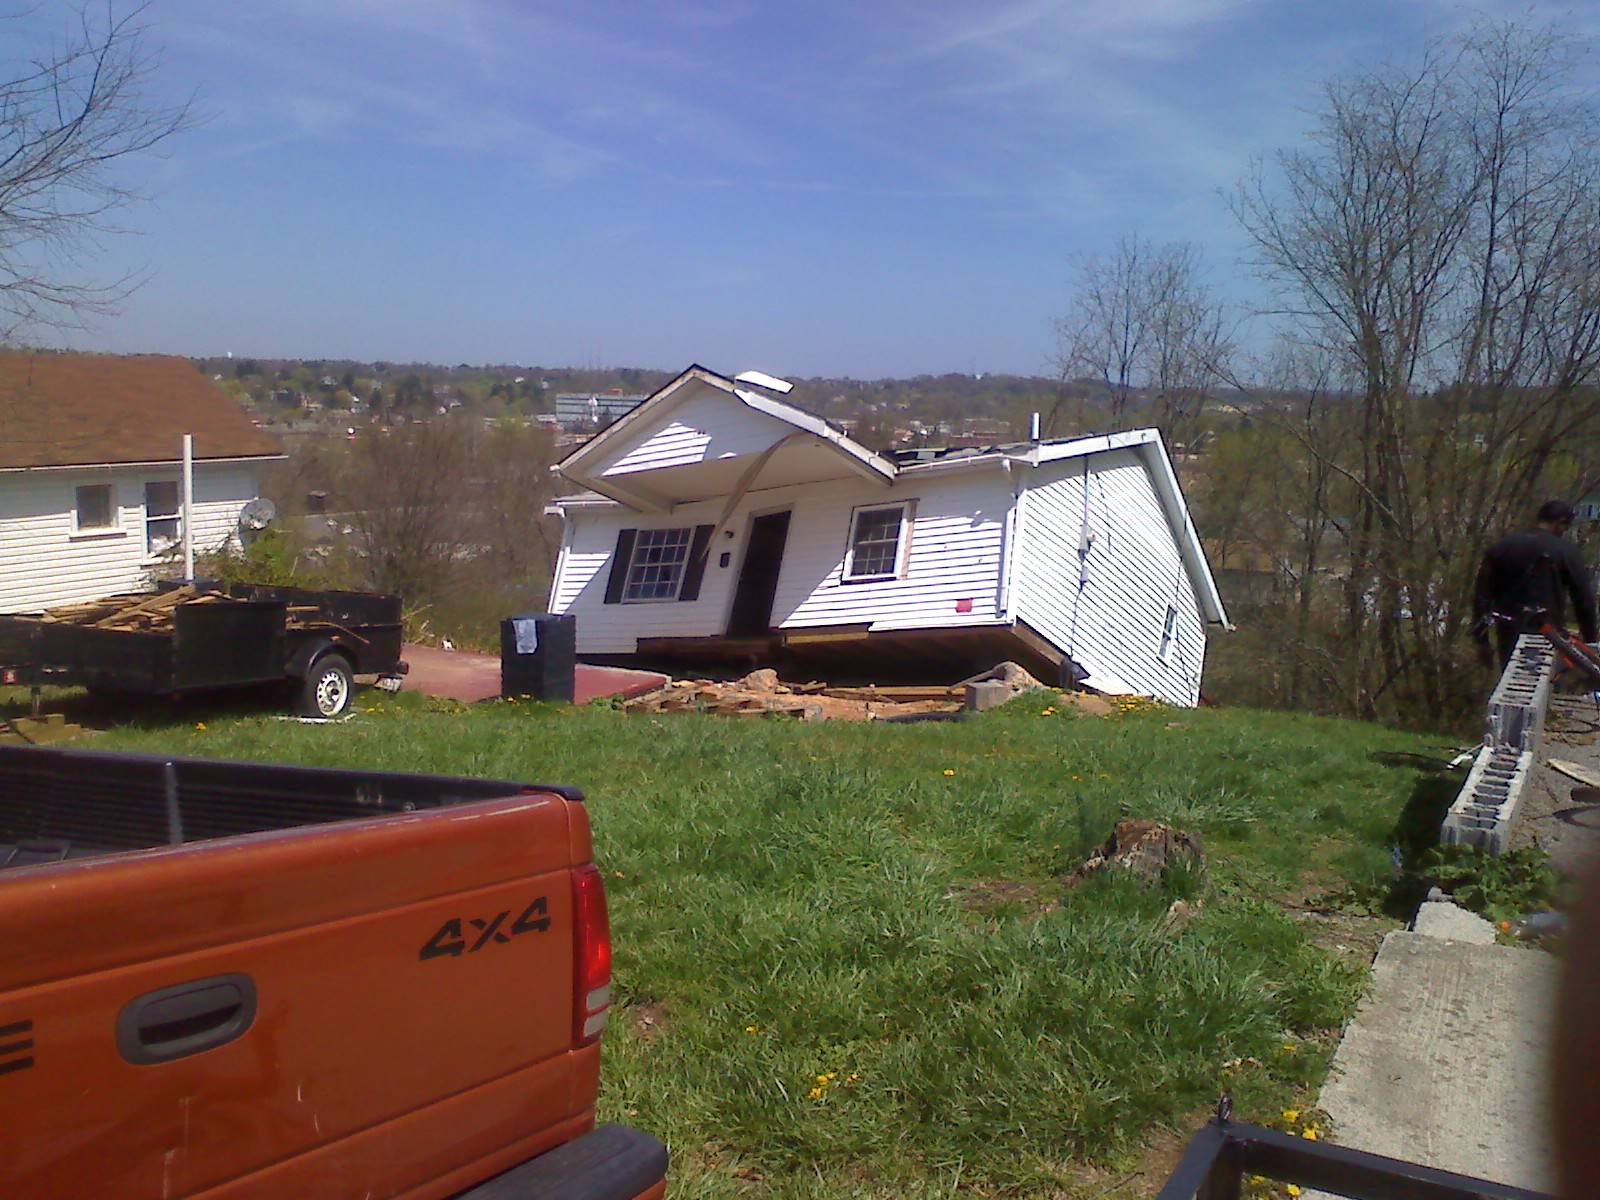 In Town of Pulaski Apr14 03 USED RADIO 3-11-14 Grouper 2-20-18